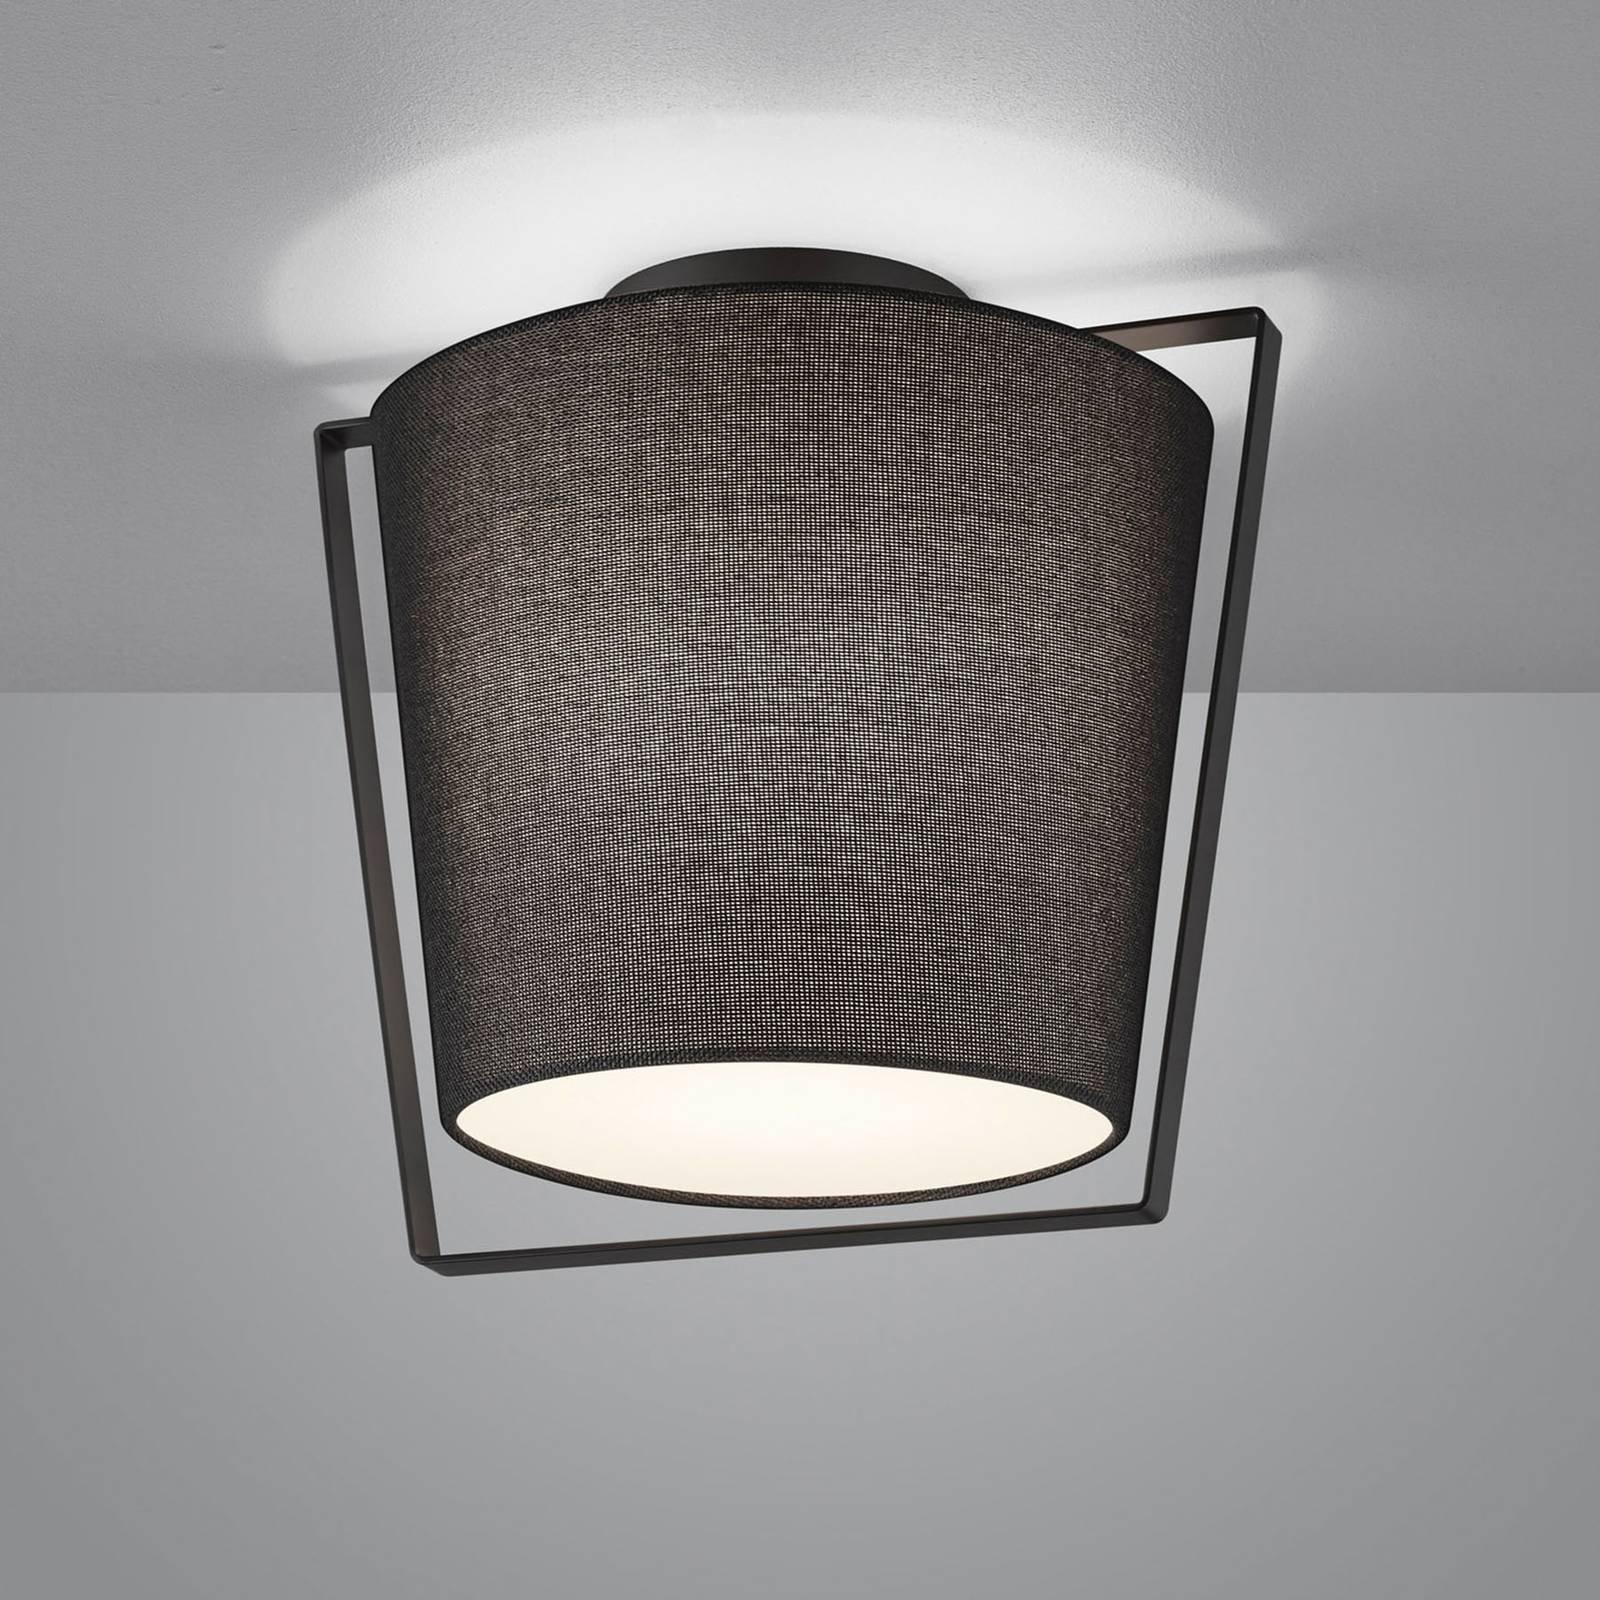 Helestra Uka taklampe, tekstilskjerm, svart